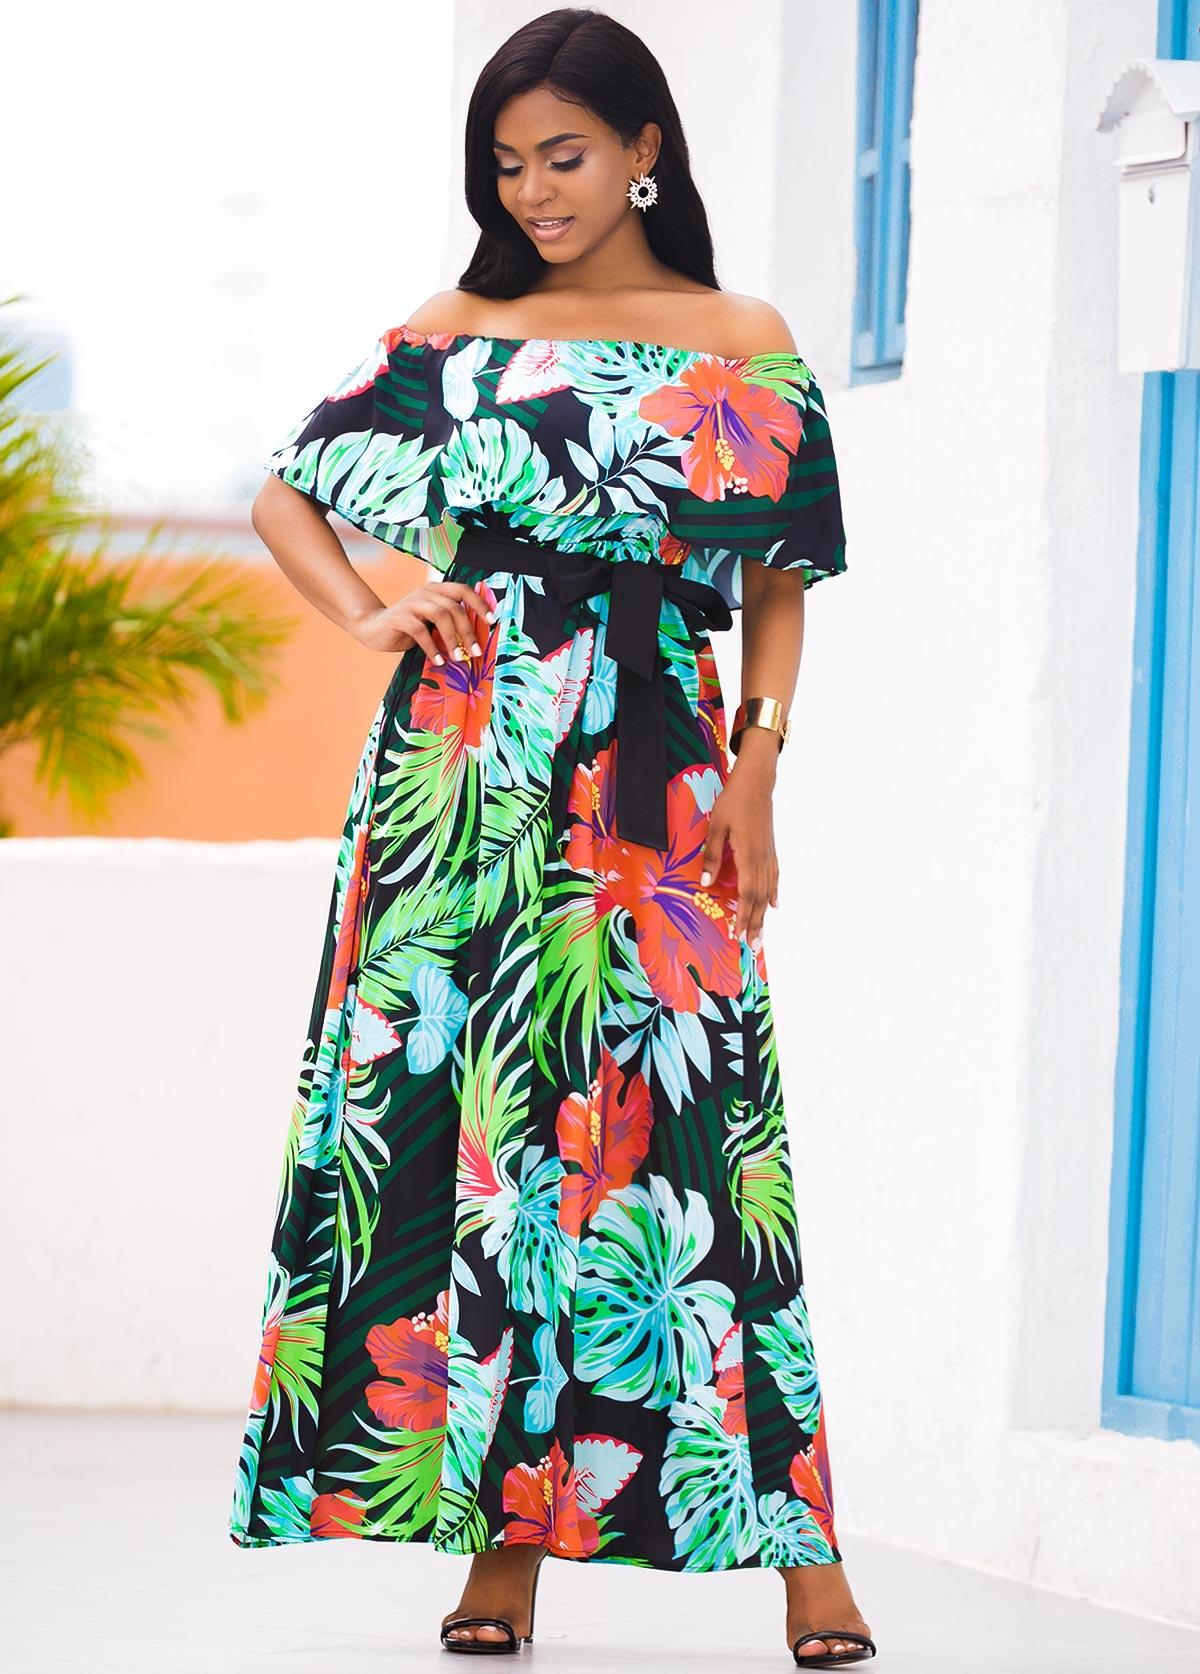 ROTITA Off the Shoulder Tropical Print Overlay Maxi Dress